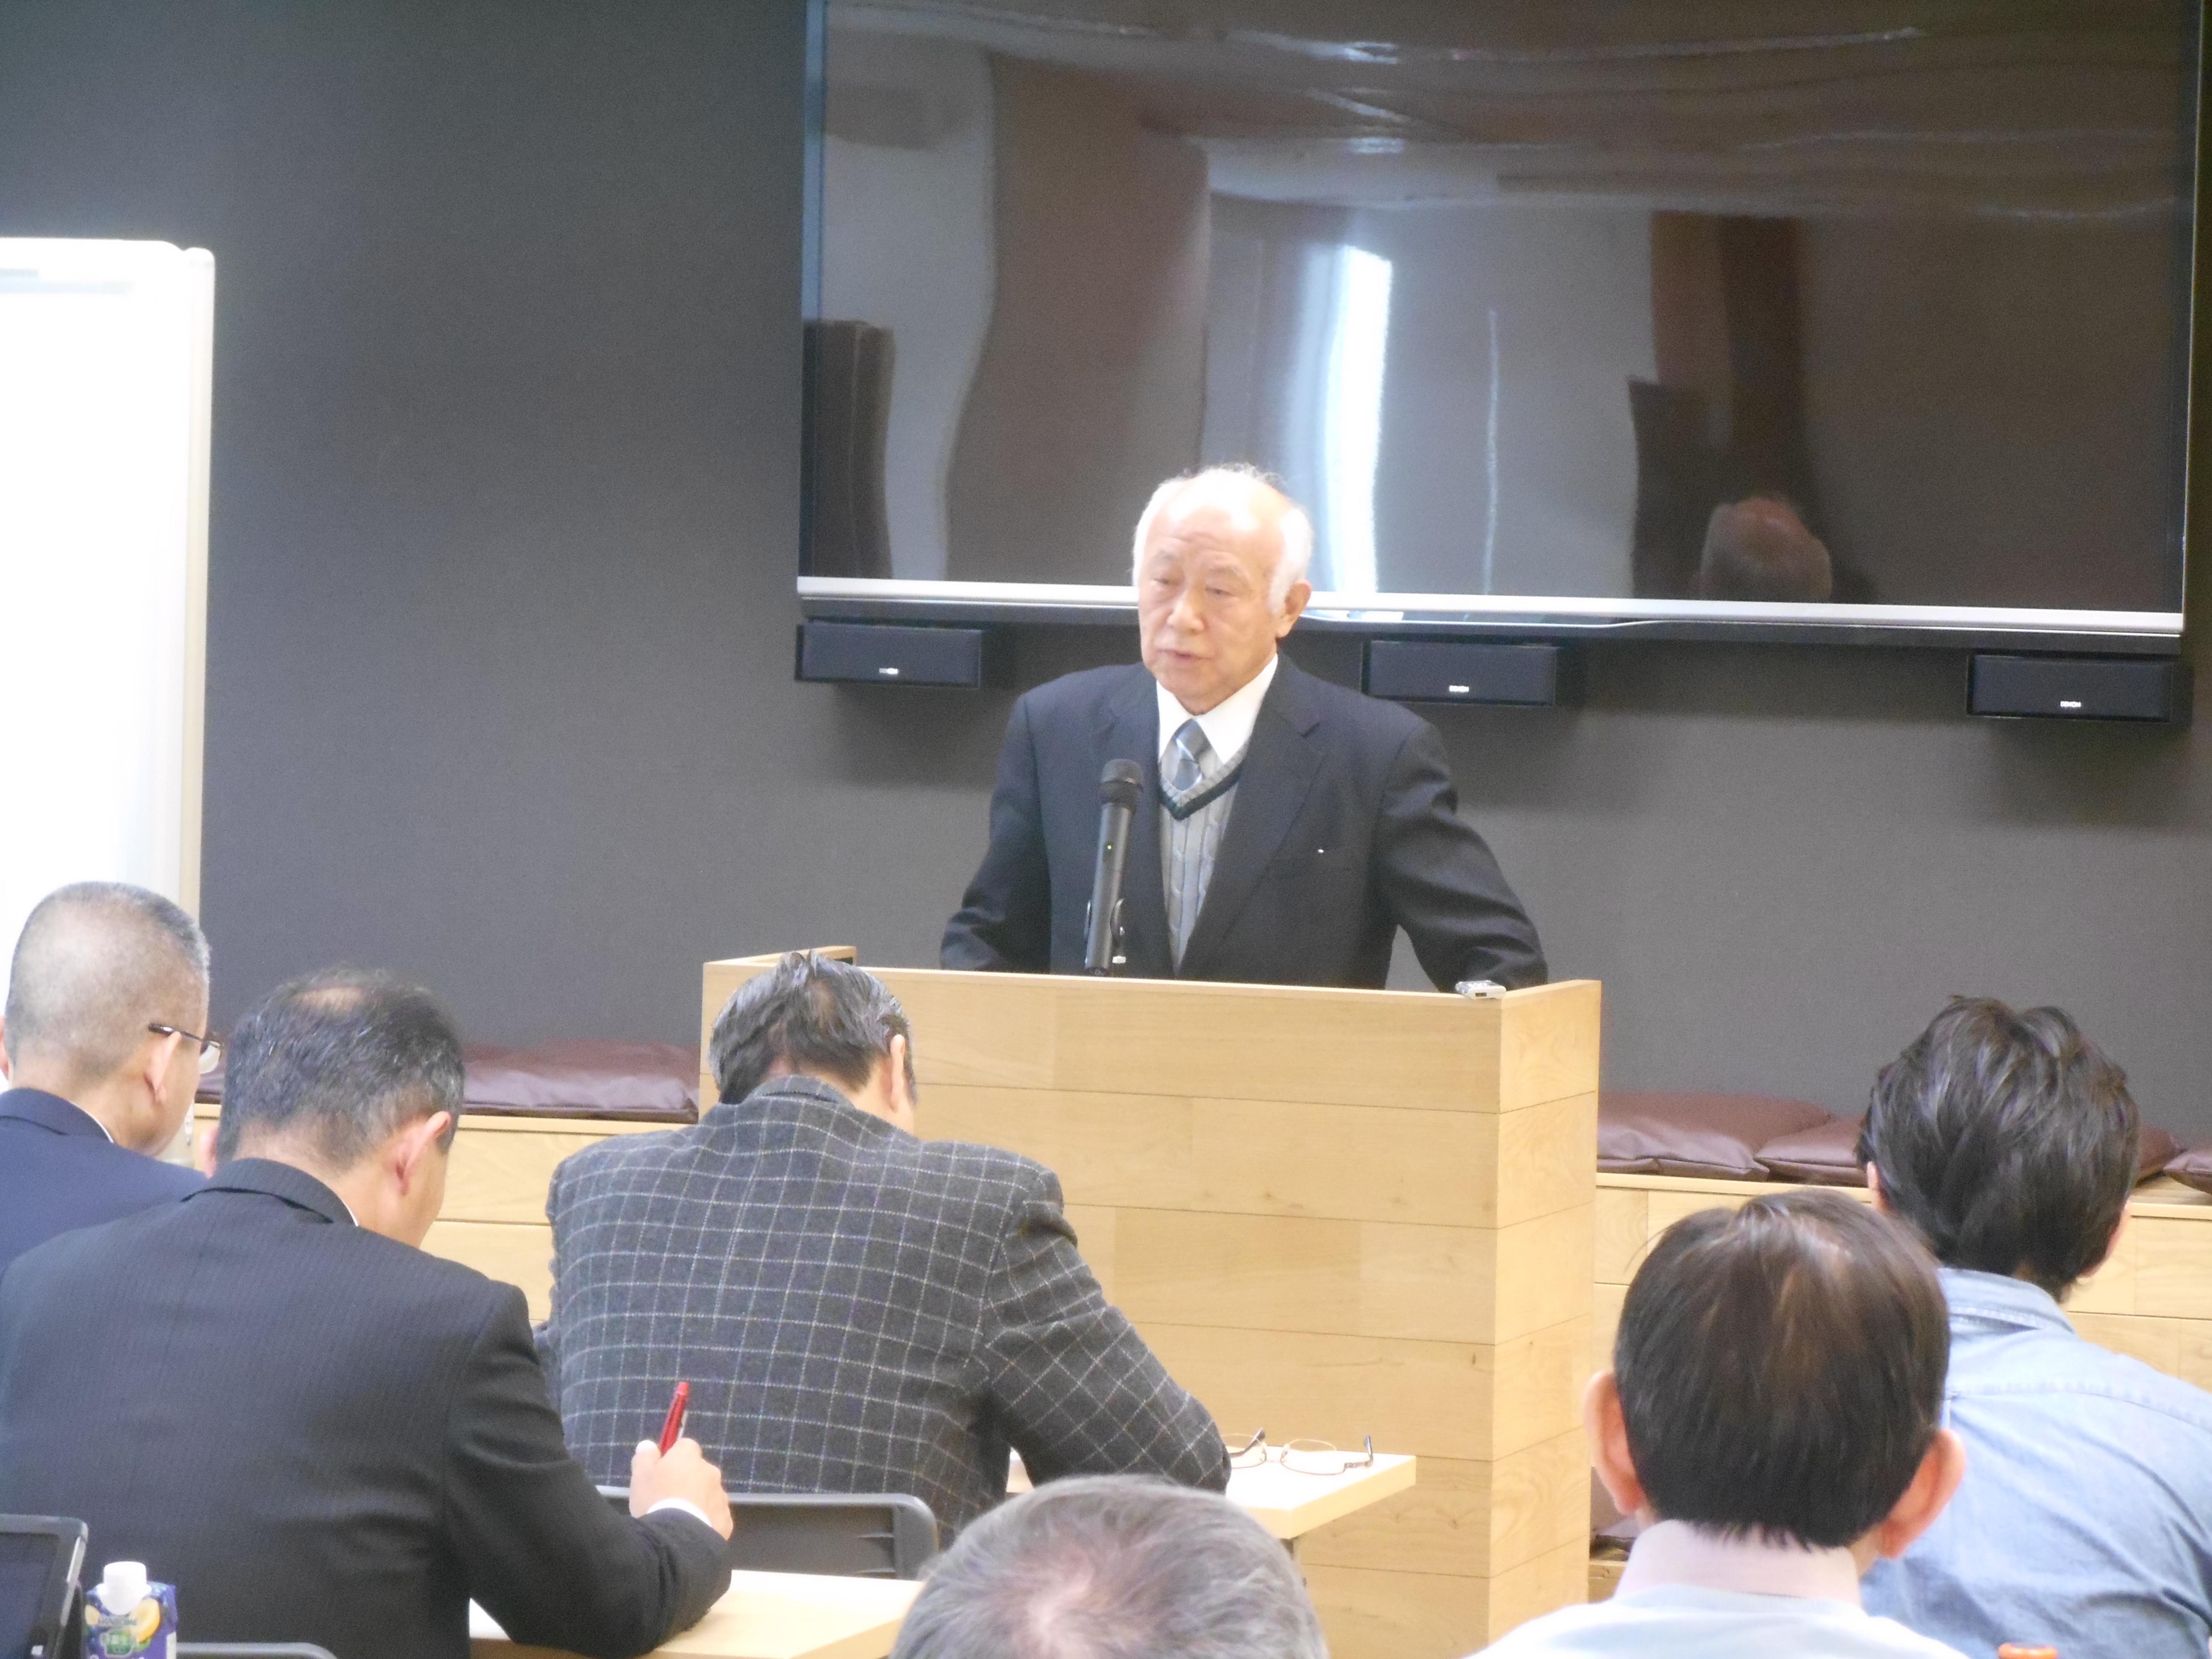 DSCN0041 1 - 平成30年度 東京思風塾 4月7日(土)「時代が問題をつくり、問題が人物をつくる」